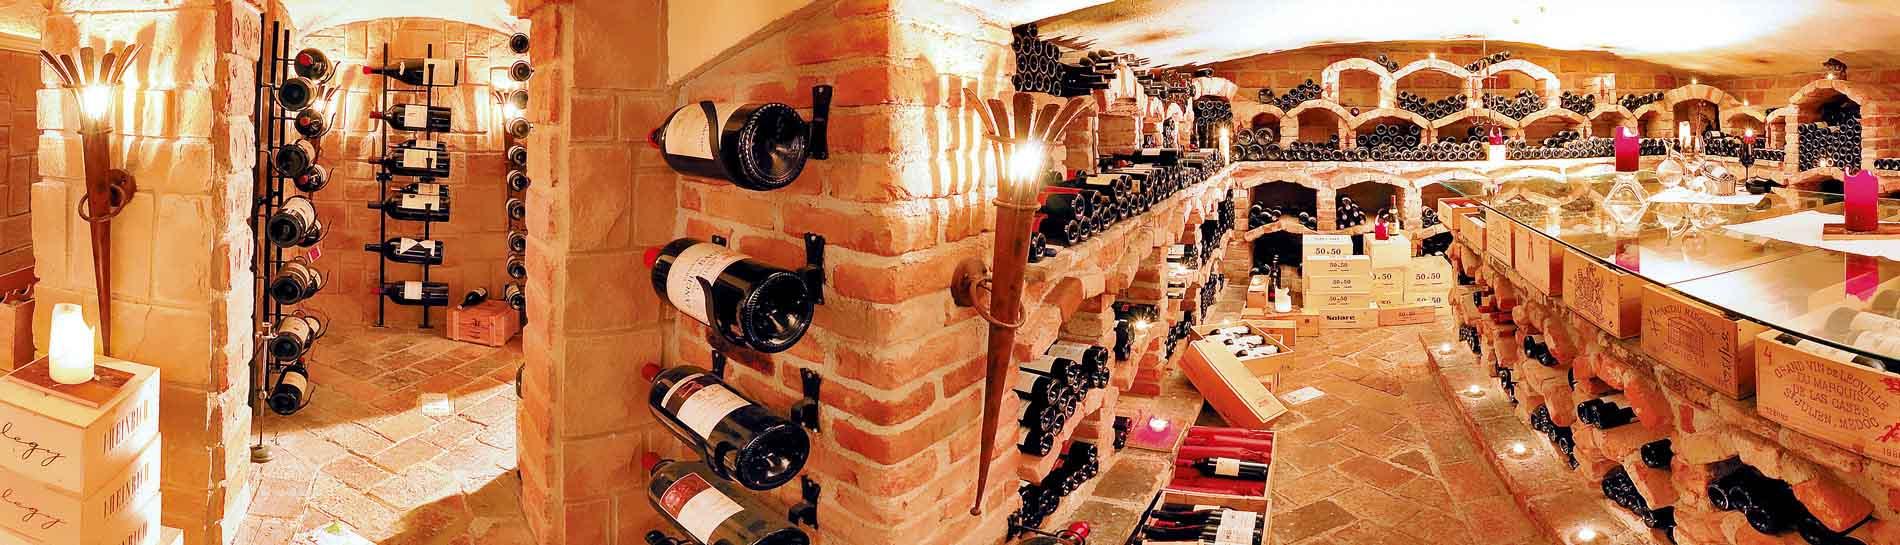 SPA-HOTEL Jagdhof Neustift Tyrol Austria